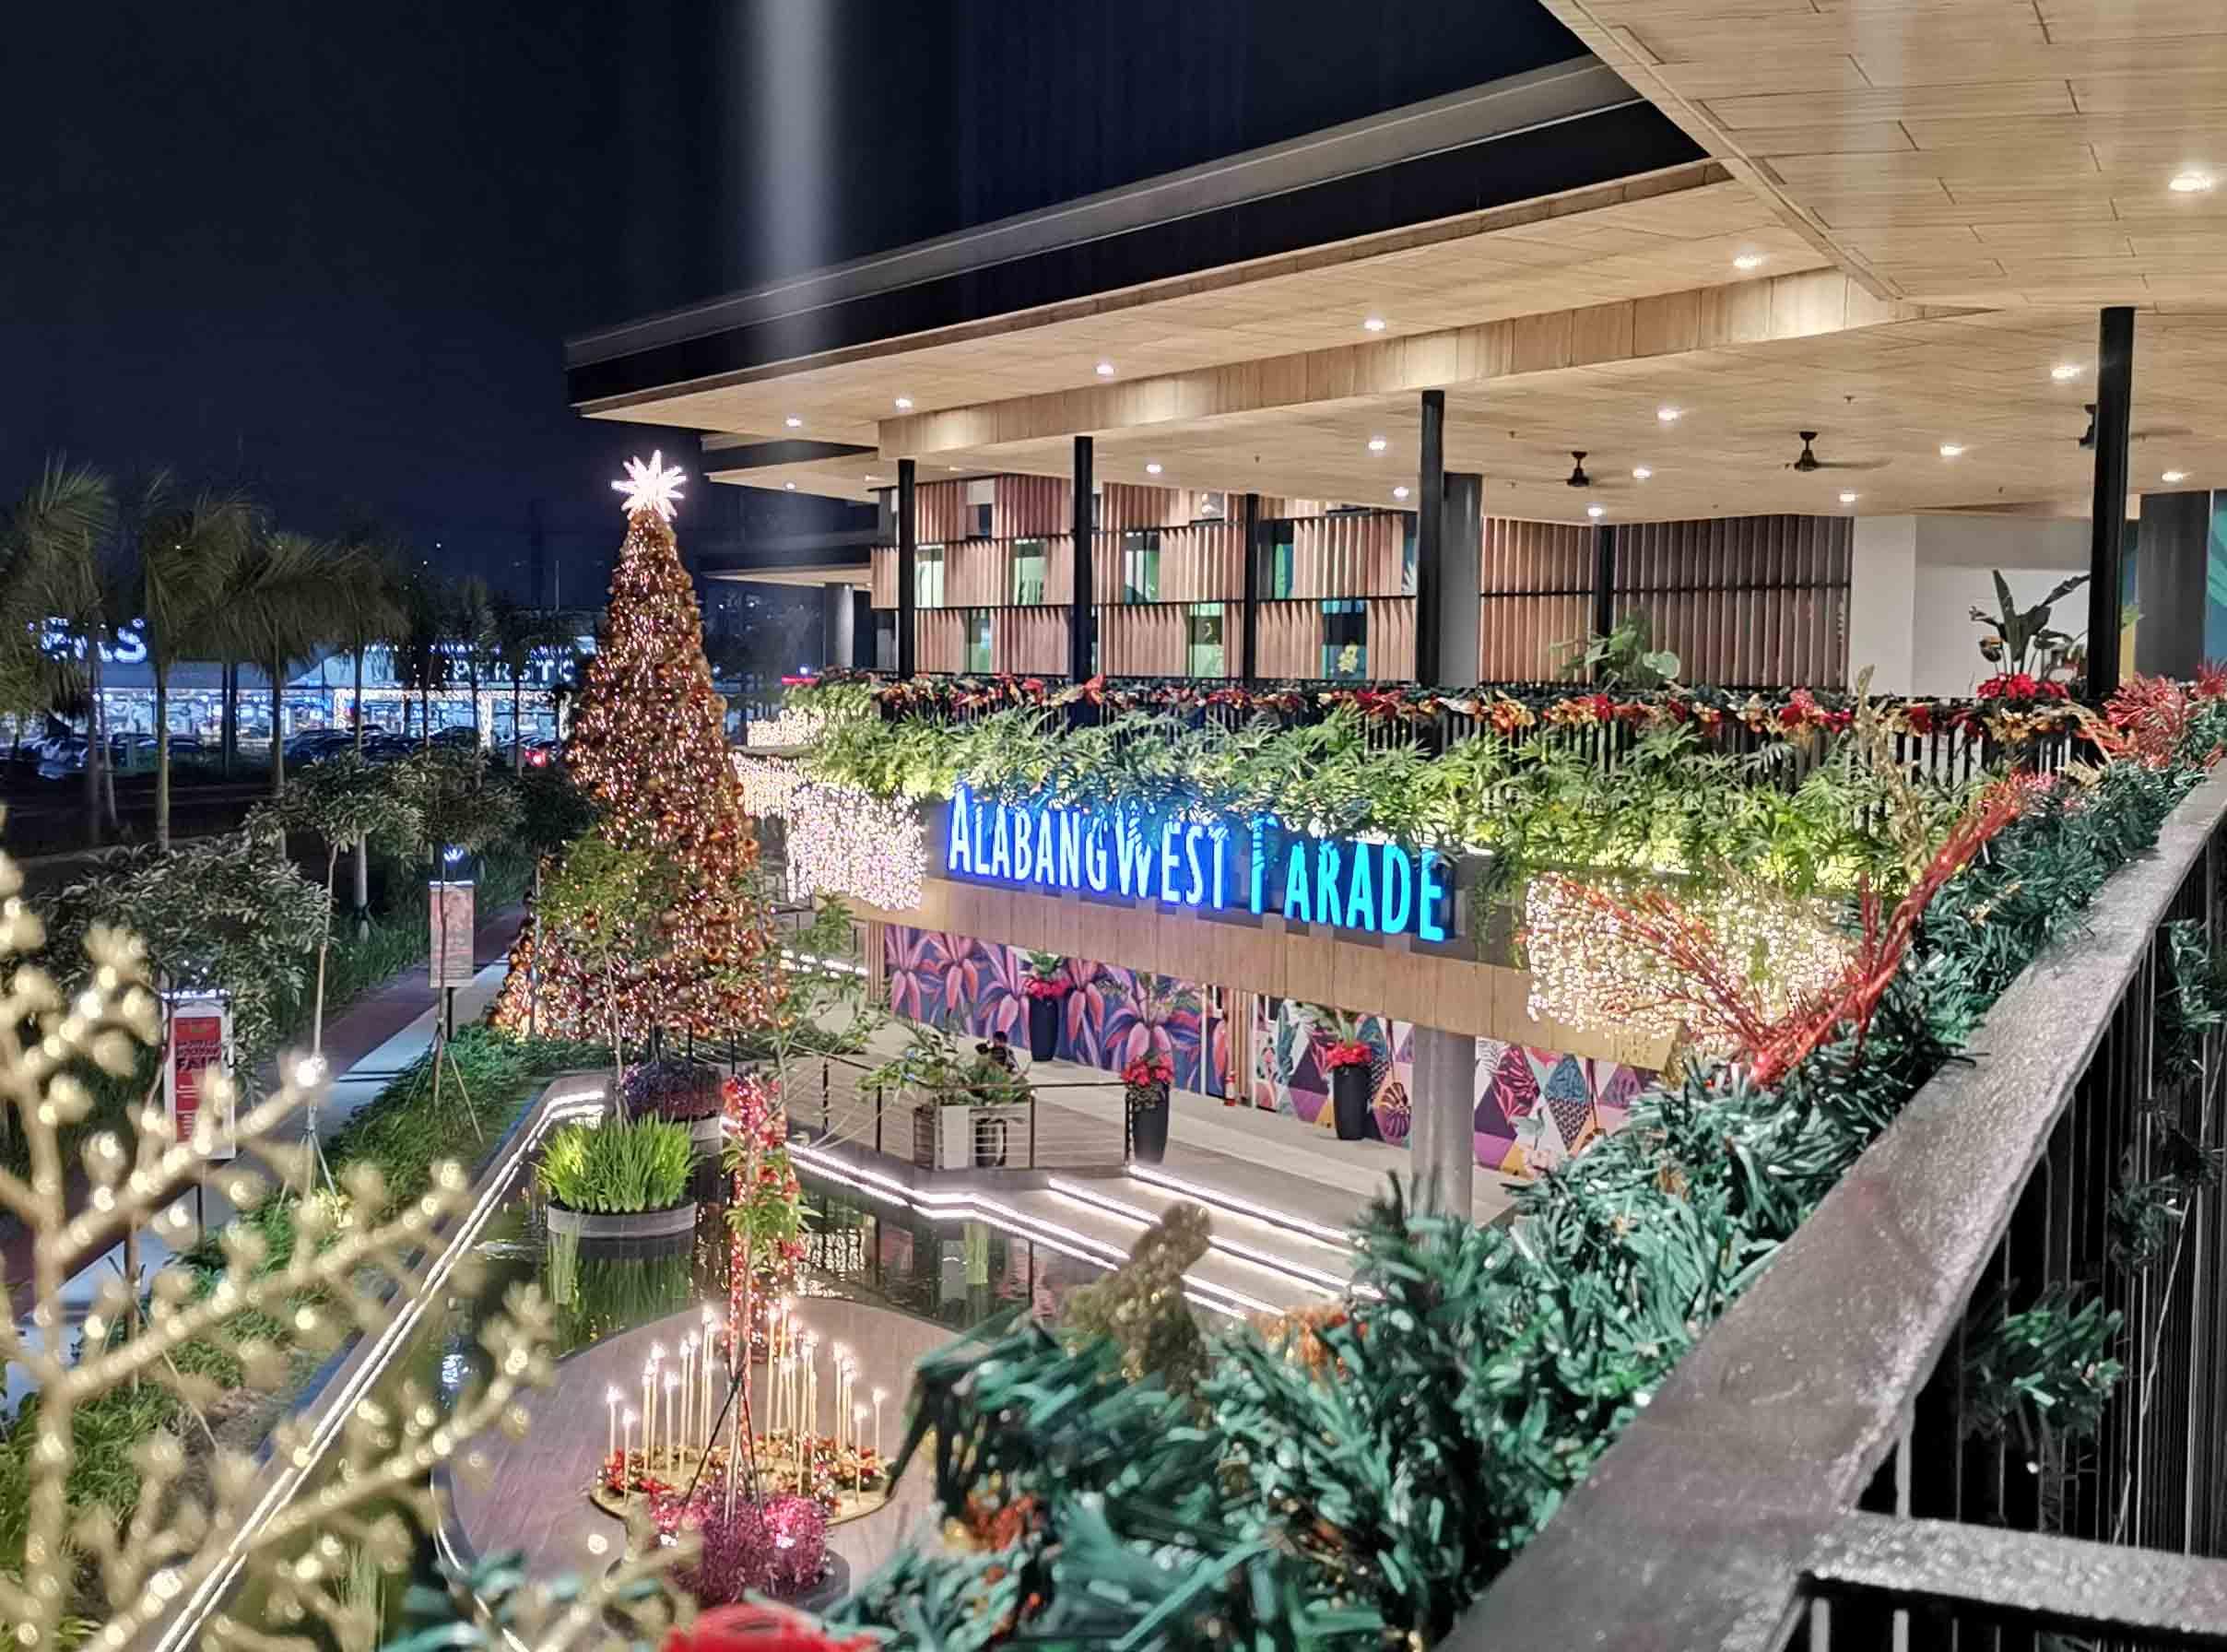 Alabang West Parade Christmas tree